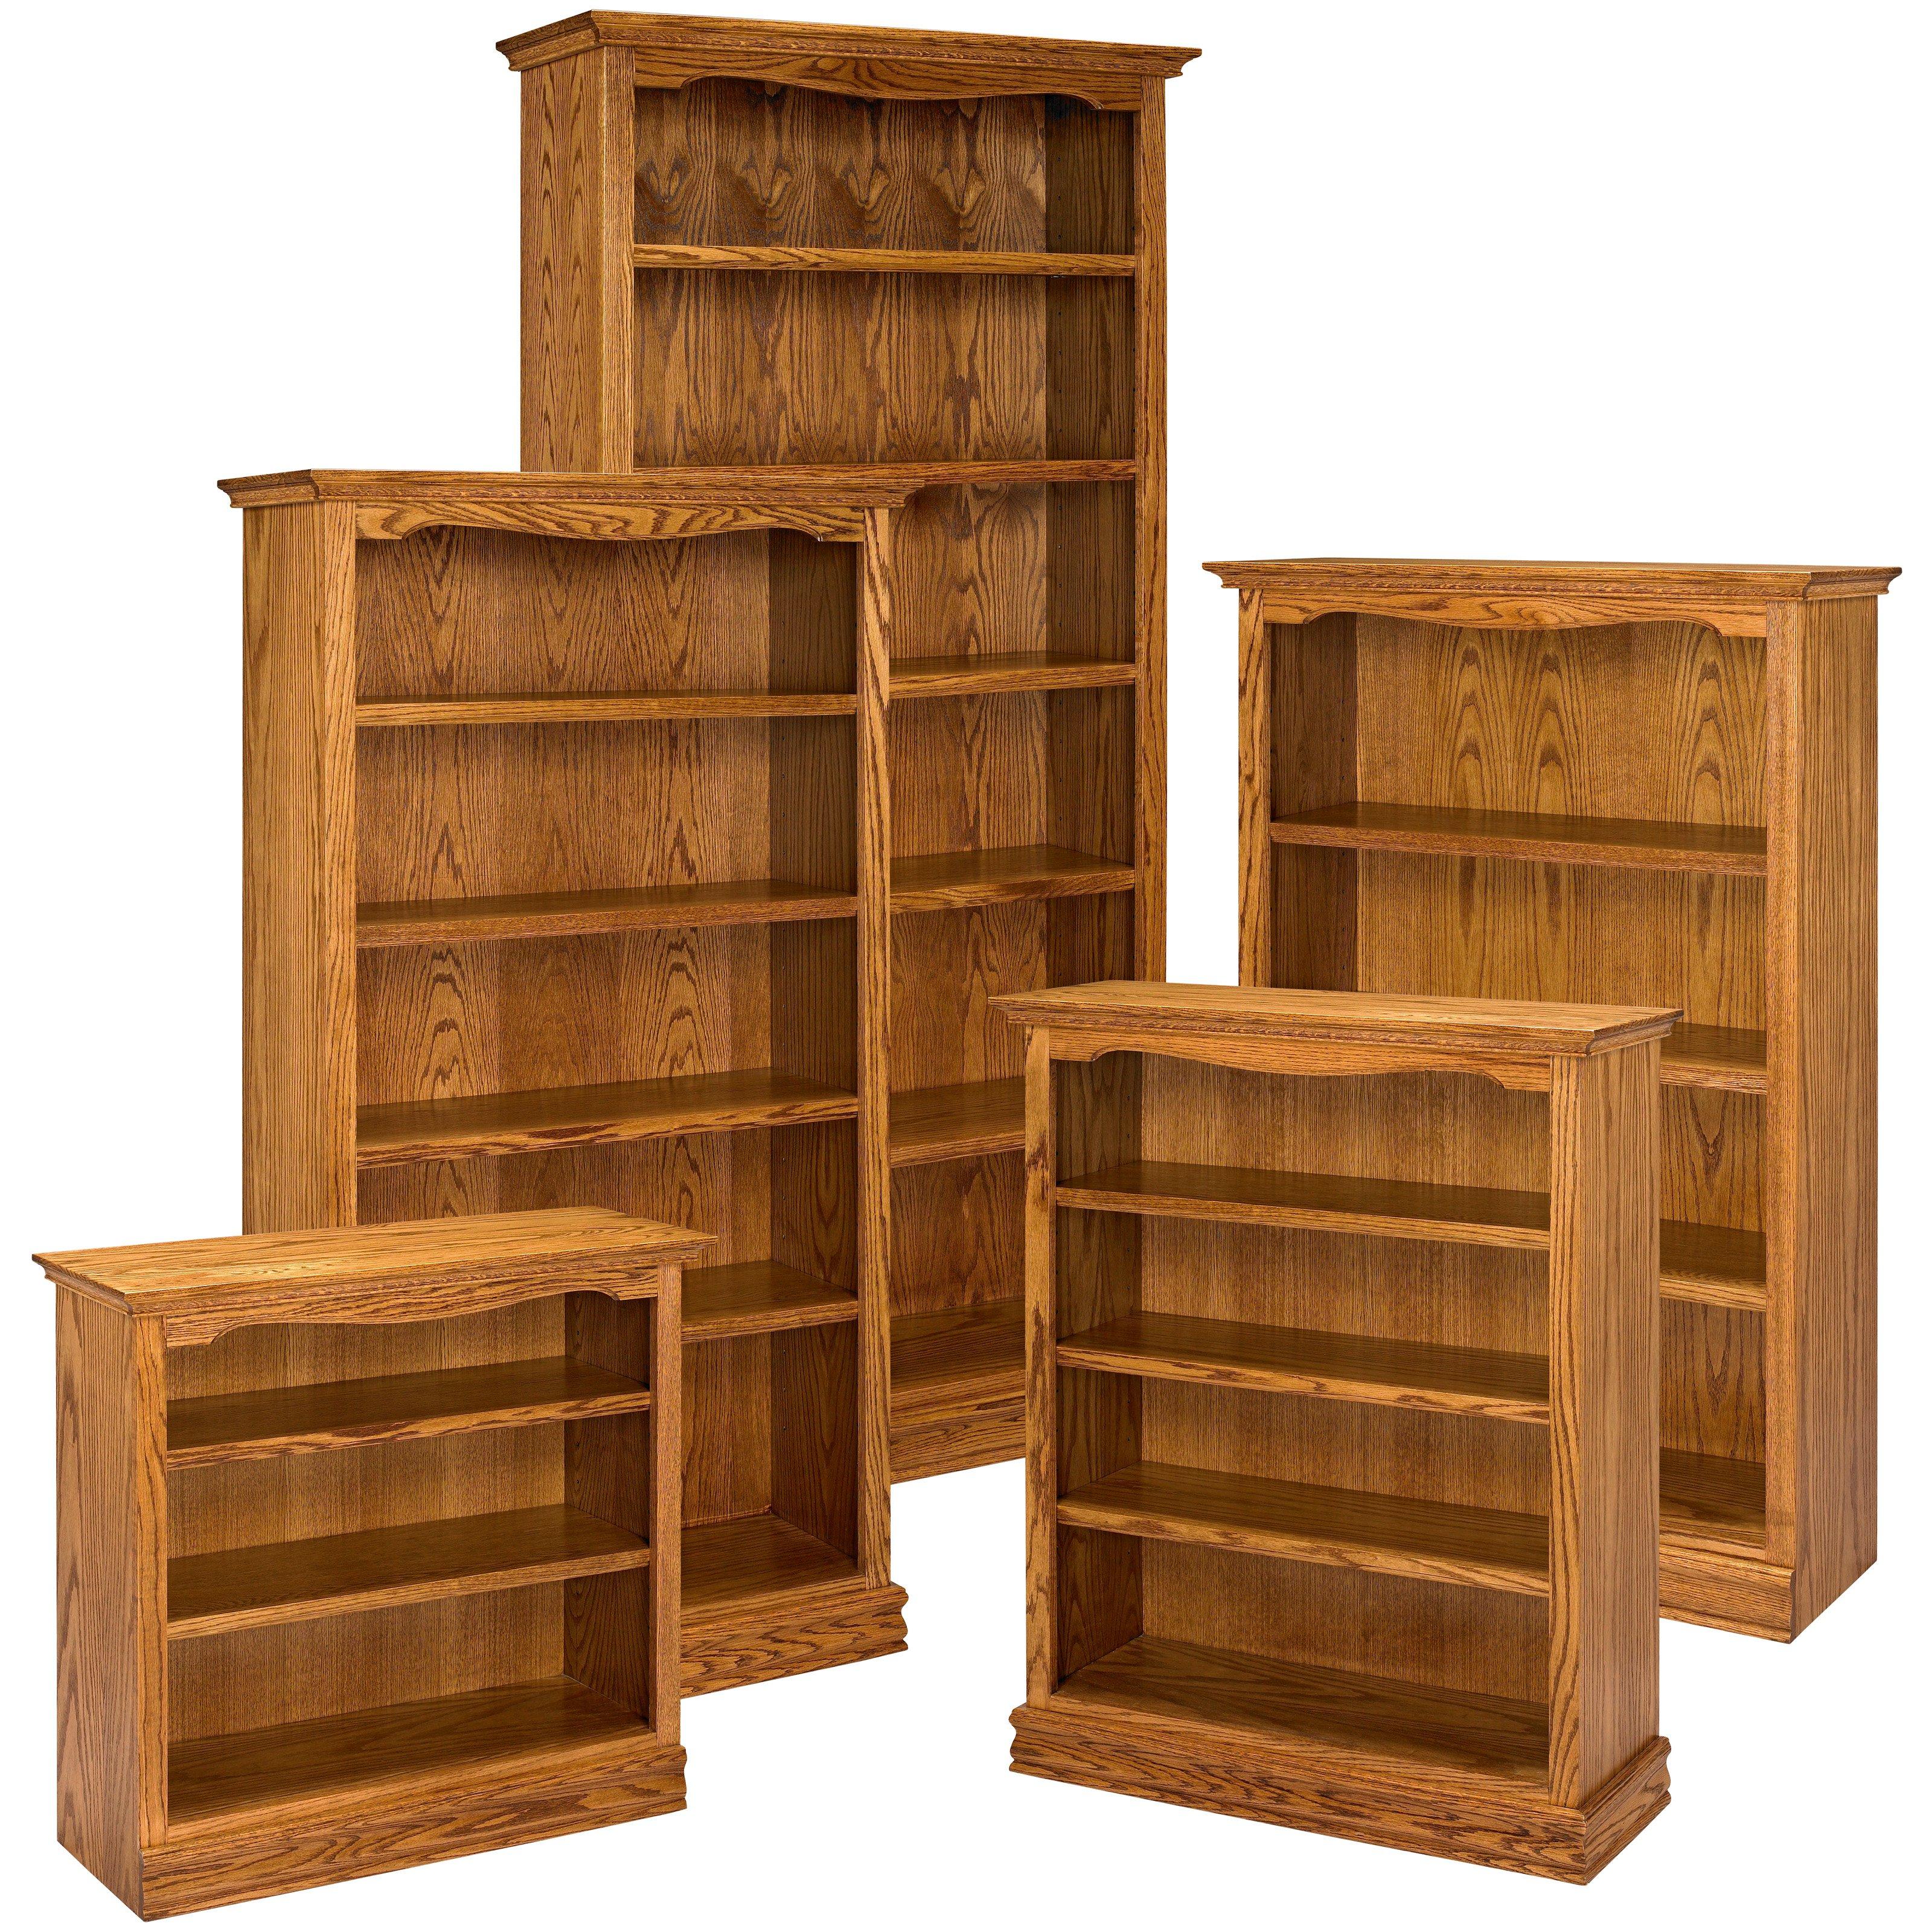 a u0026 e solid oak americana wood bookcase - bookcases at hayneedle CMNNEMT